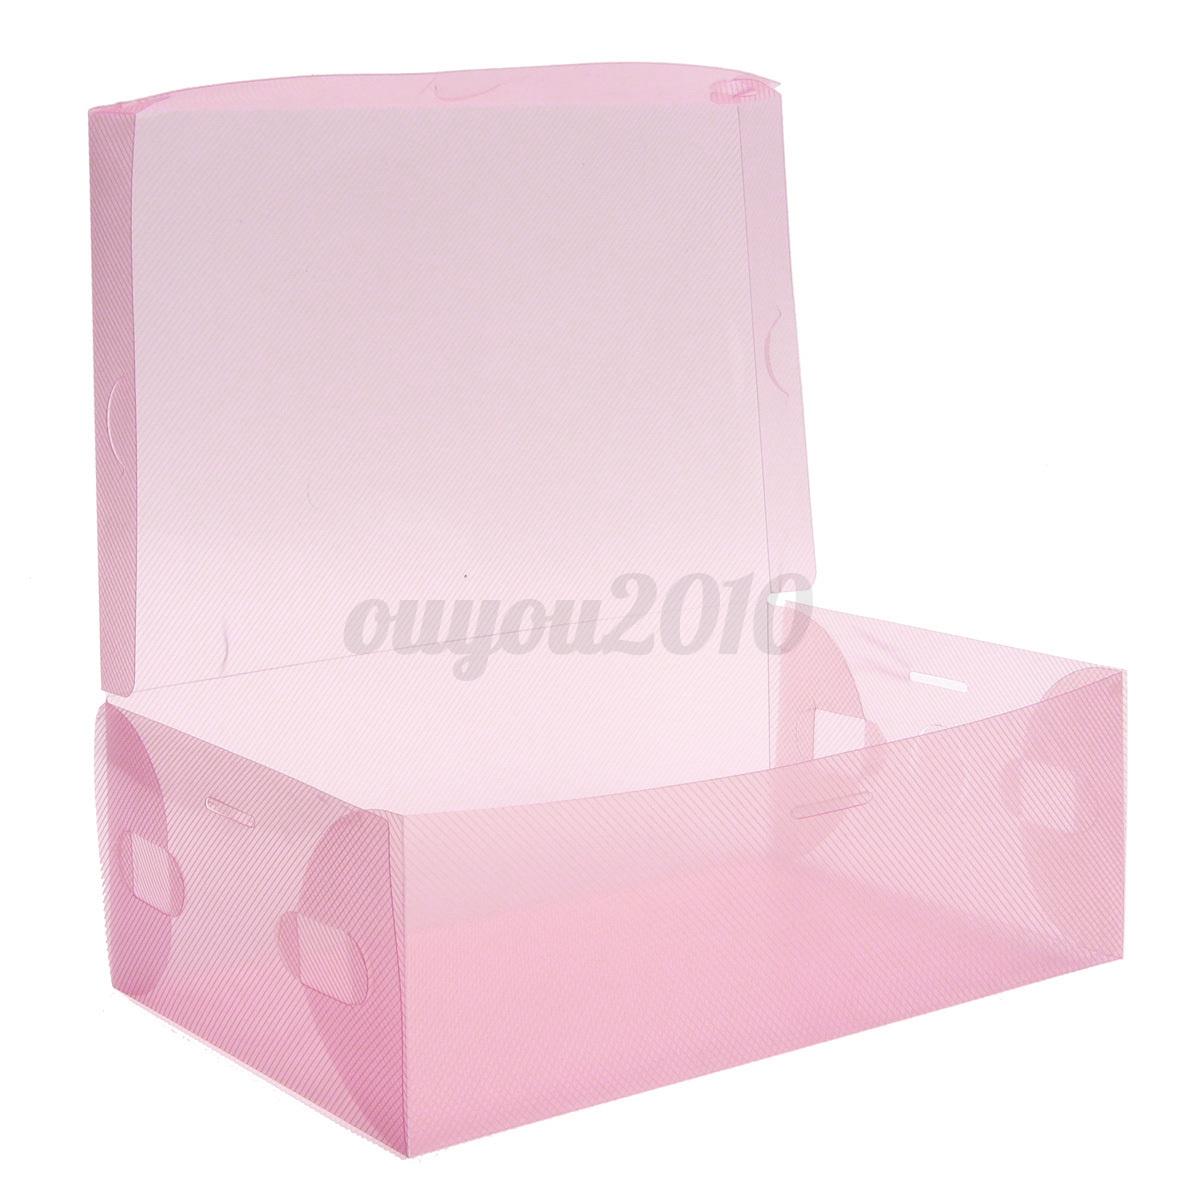 foldable clear plastic shoe storage boxes organizer stackable transparent case ebay. Black Bedroom Furniture Sets. Home Design Ideas